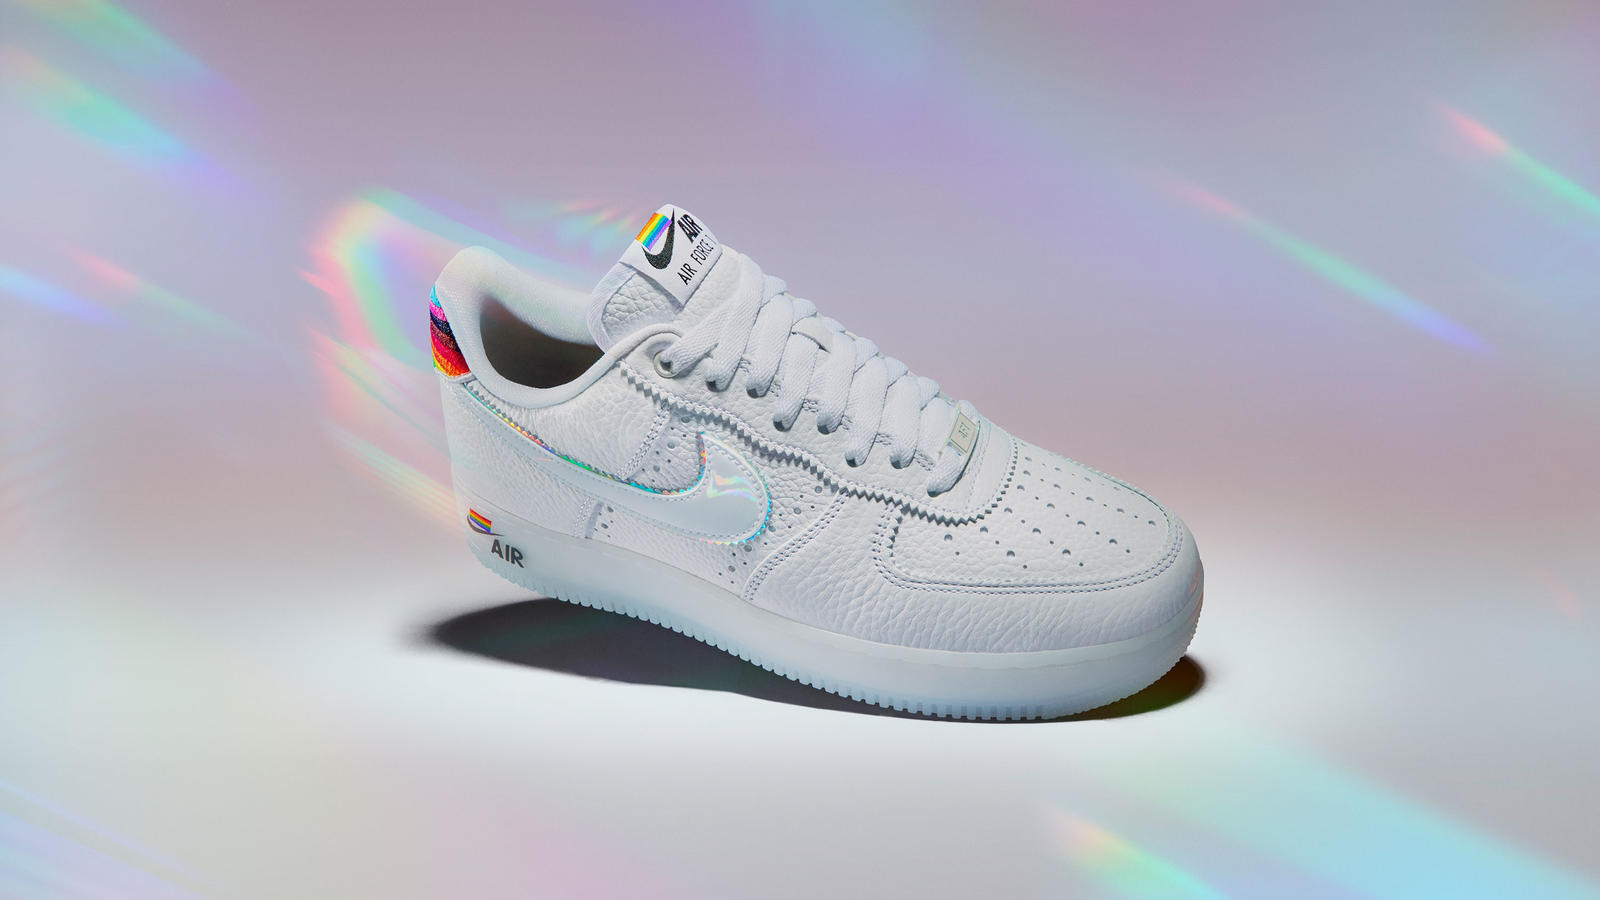 Nike BeTrue 2020 10